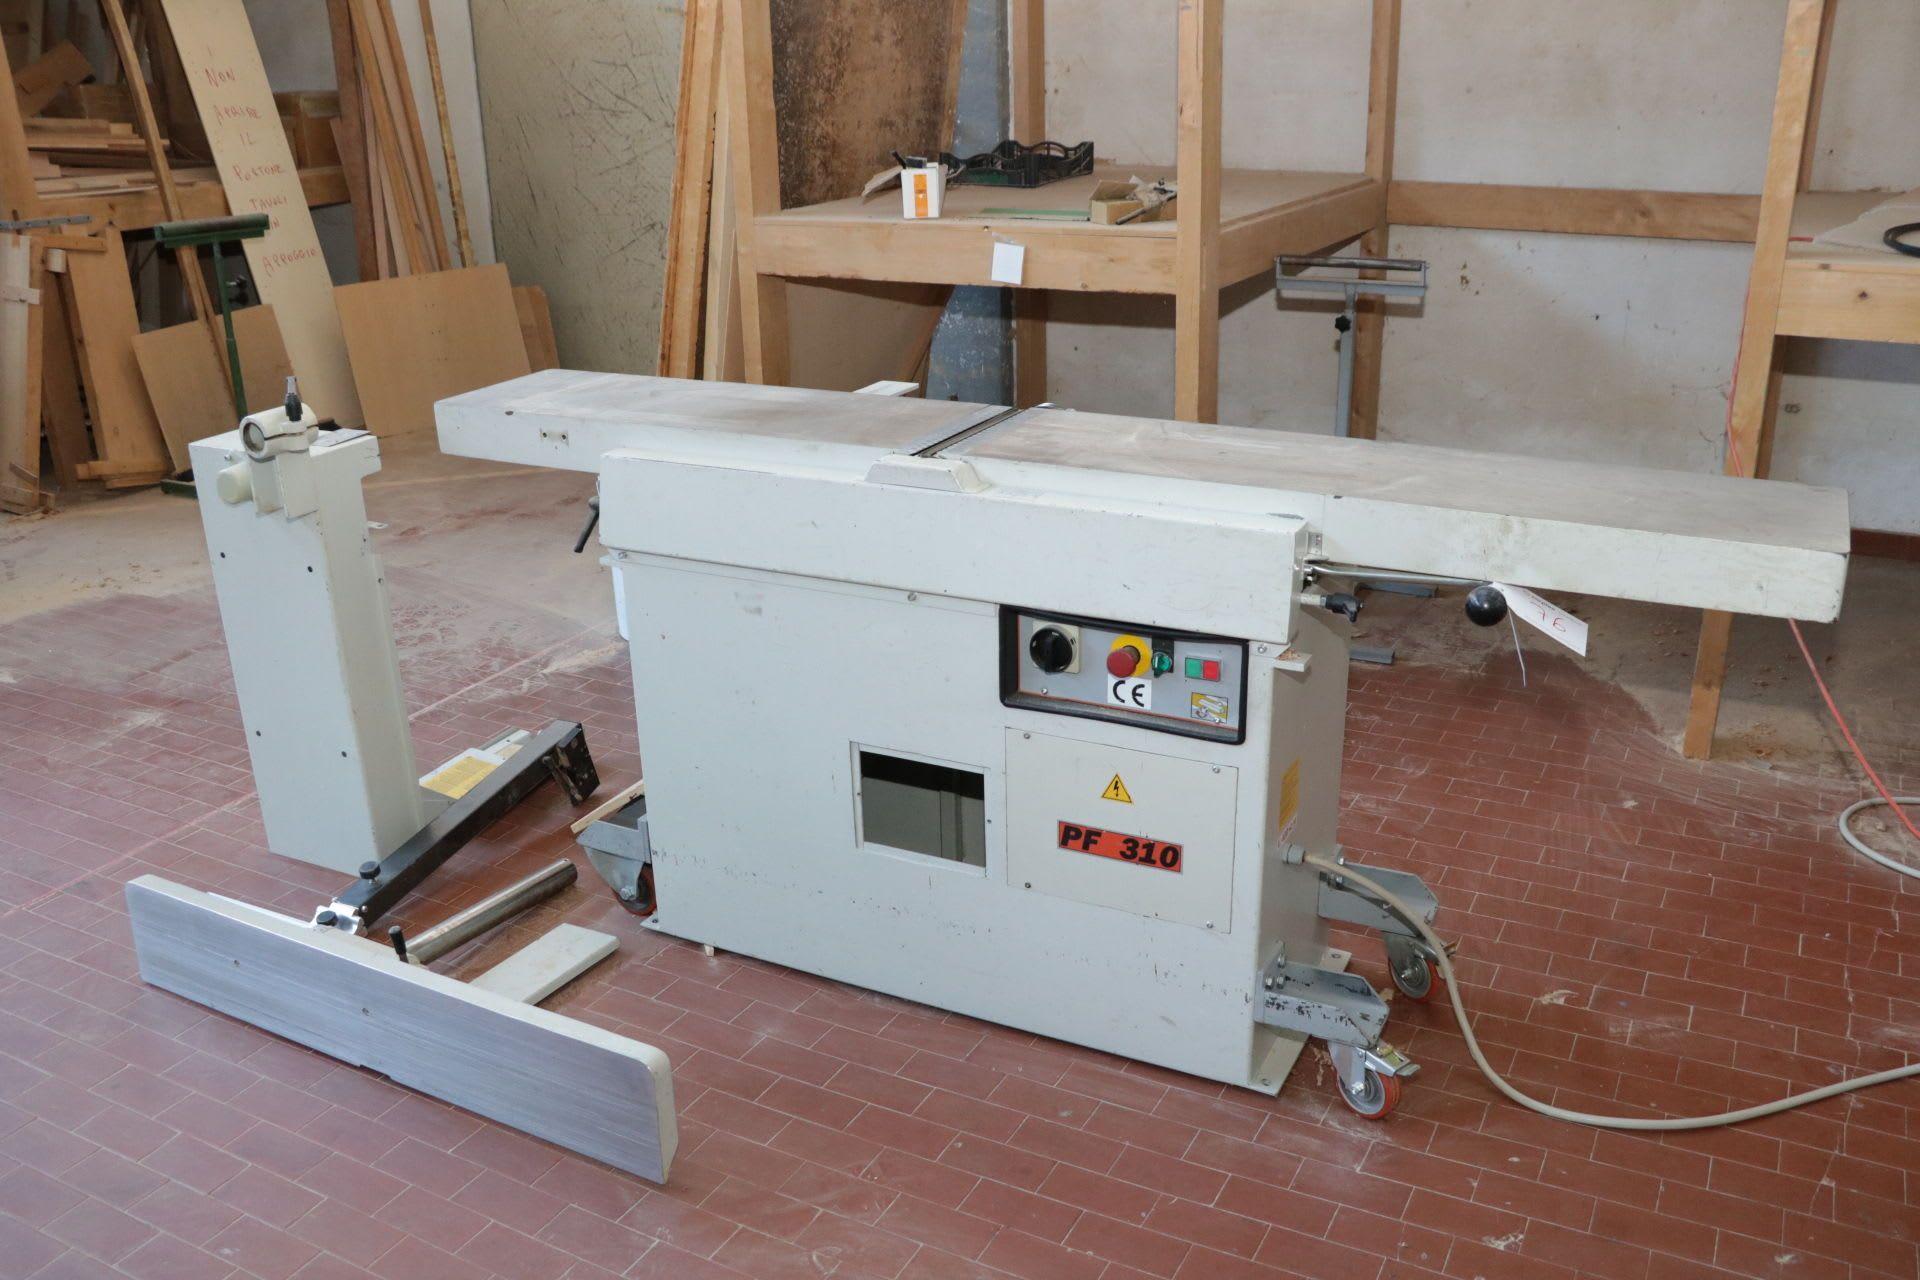 RANZATO PF310 Abrichthobelmaschine